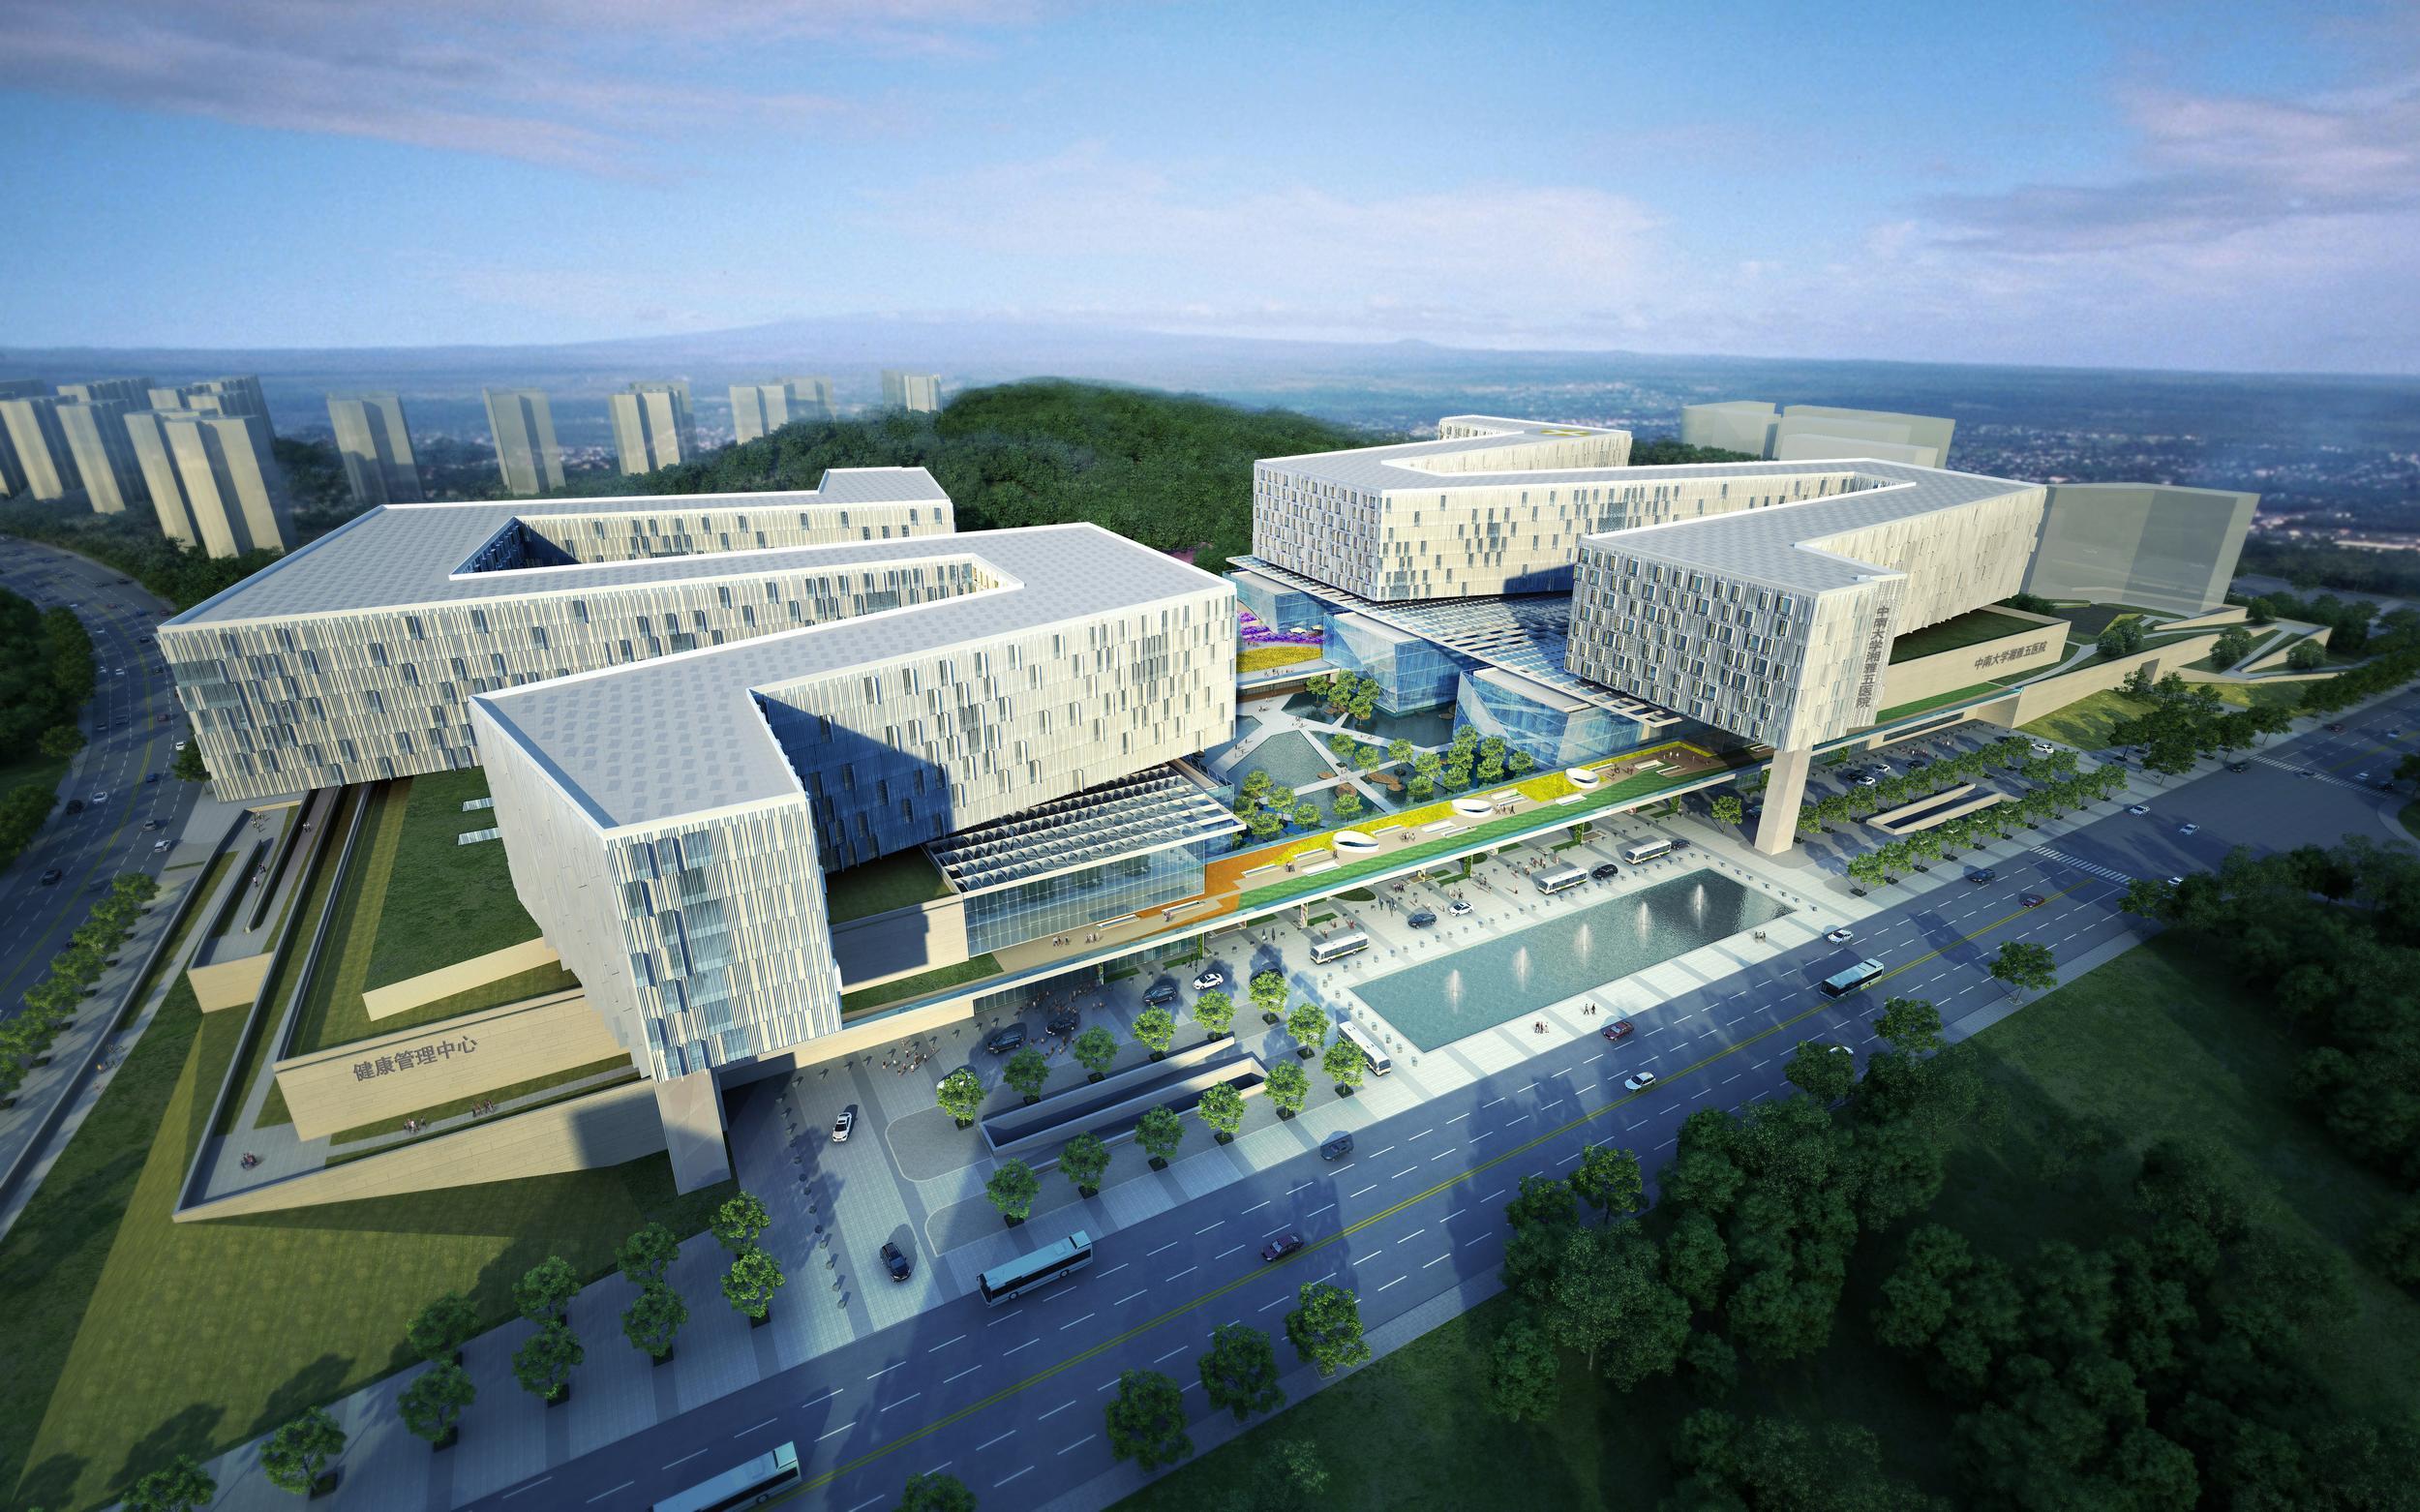 Healthcare Spaces Of The Future  Smart Design  Healthier Patients  U2013 Blueprint  Presented By Cbre